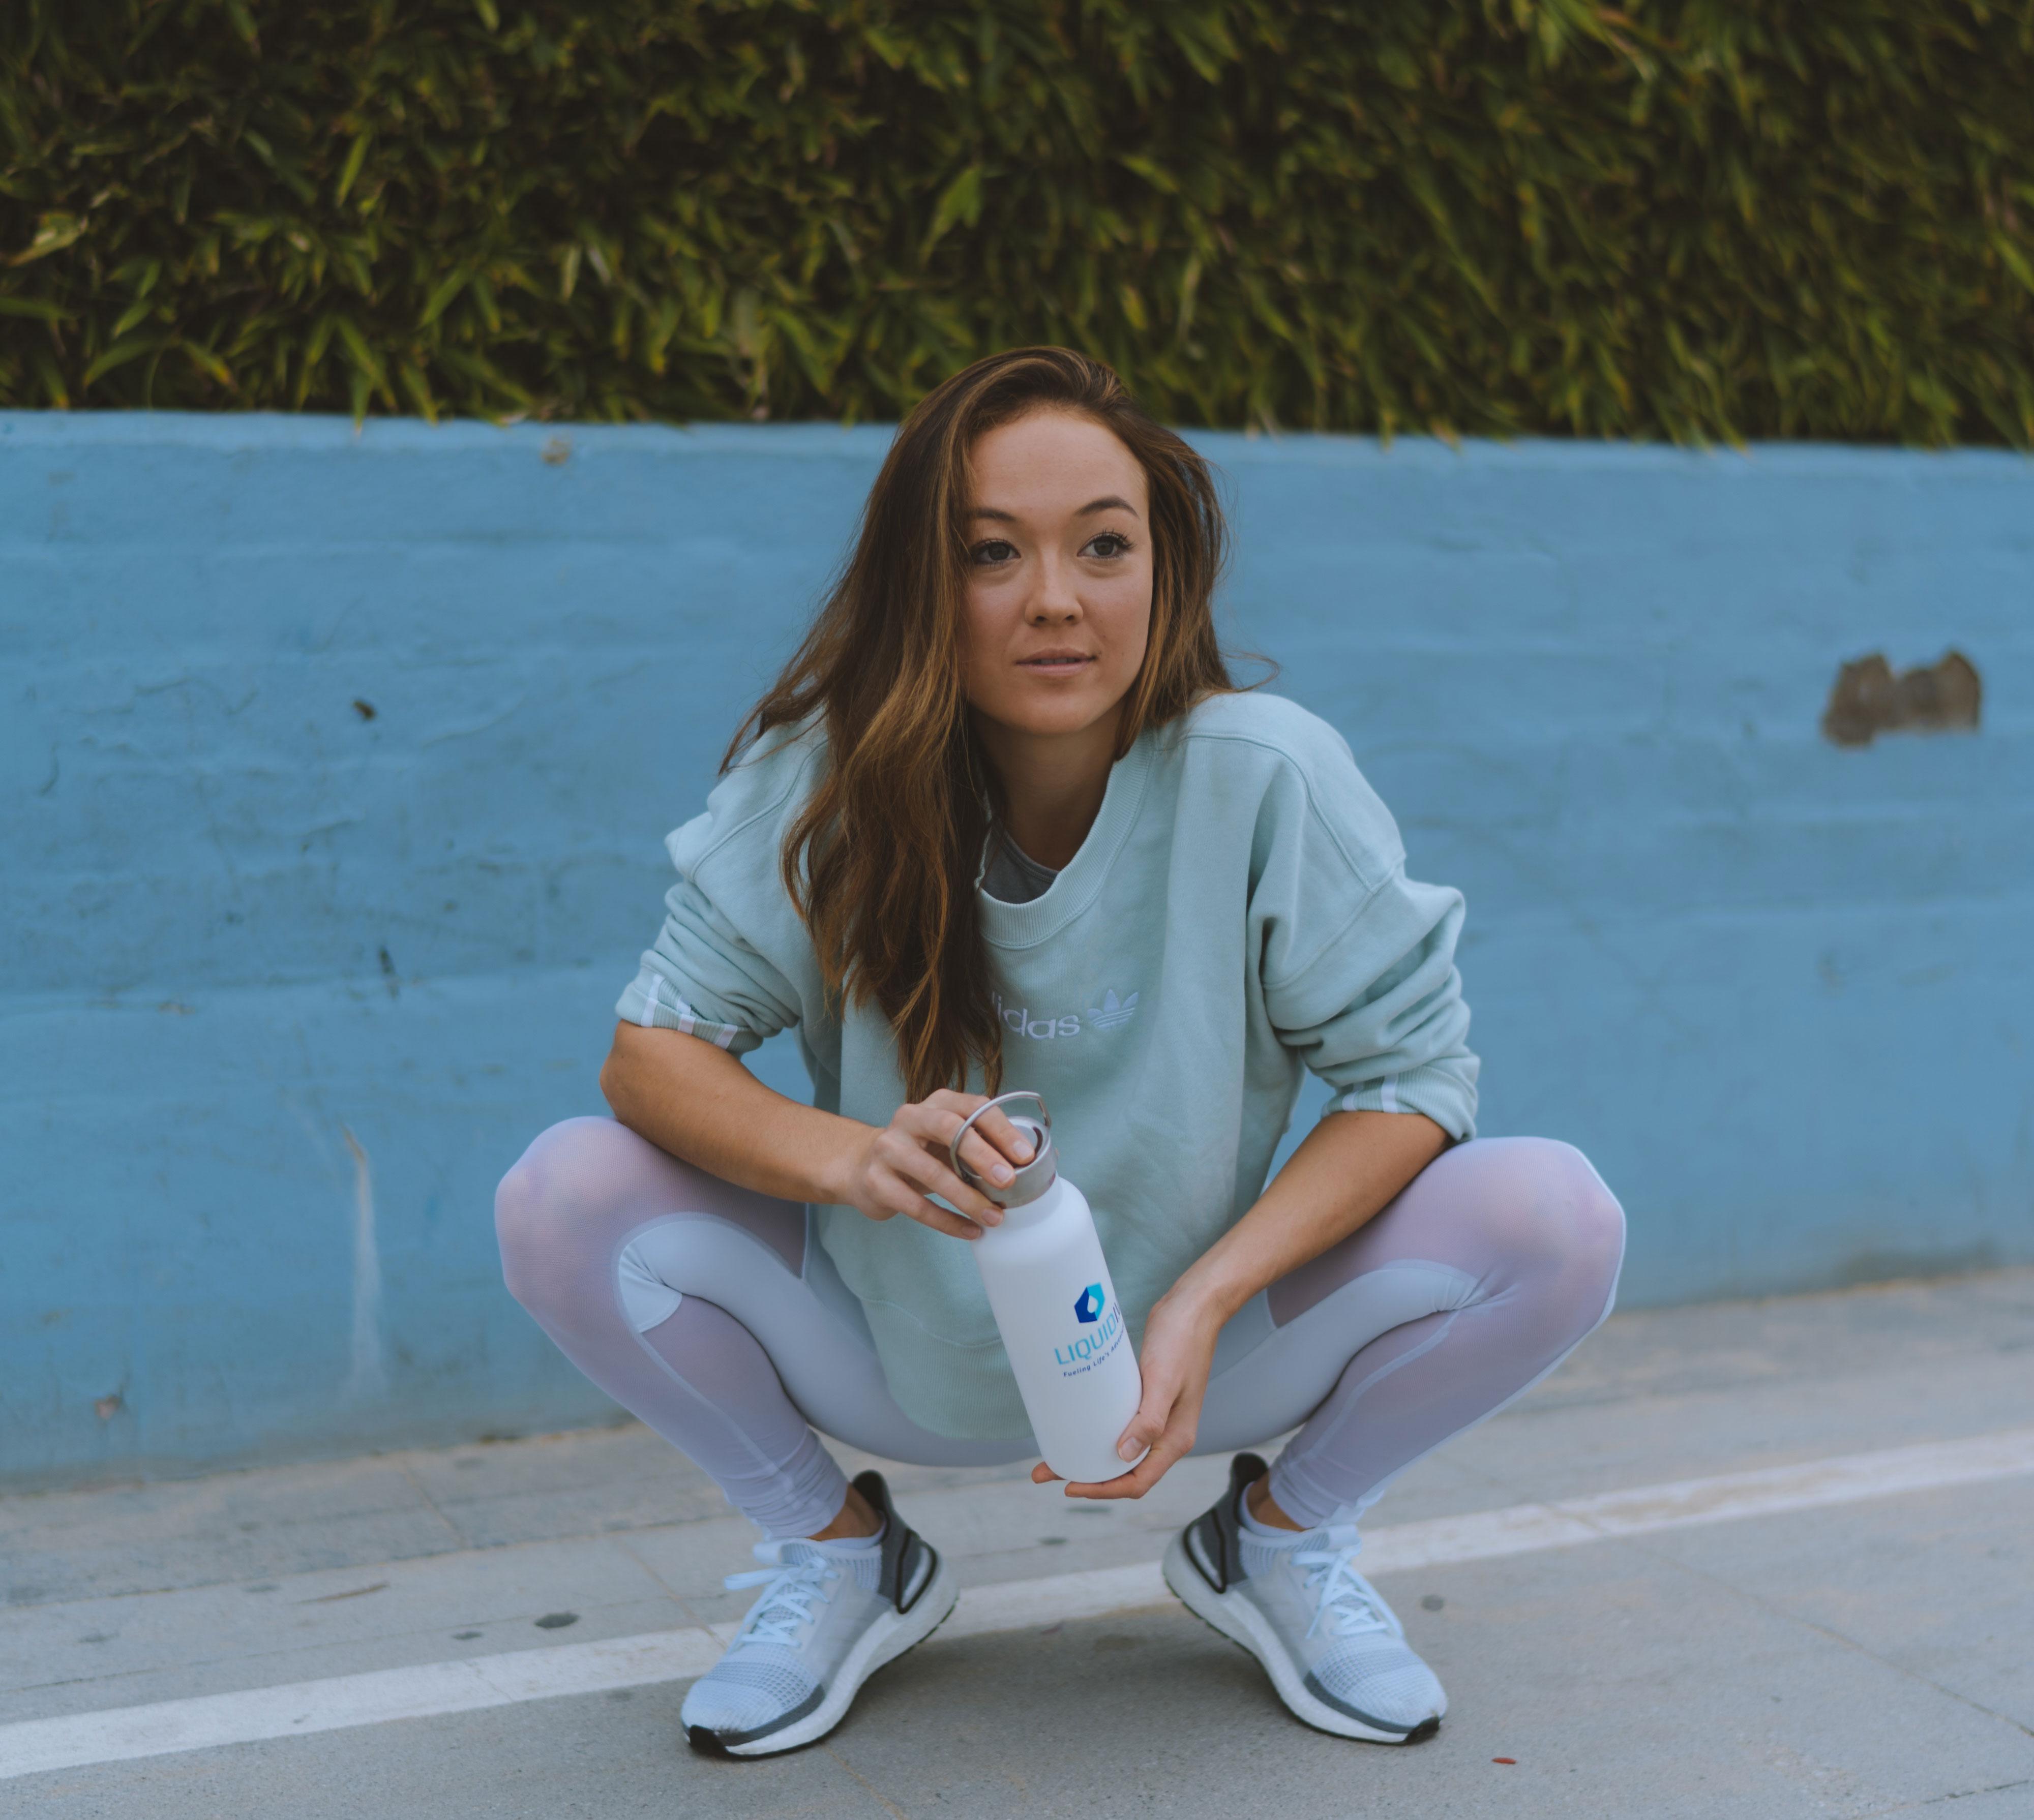 Model on set in squat position holding Liquid I.V. water bottle